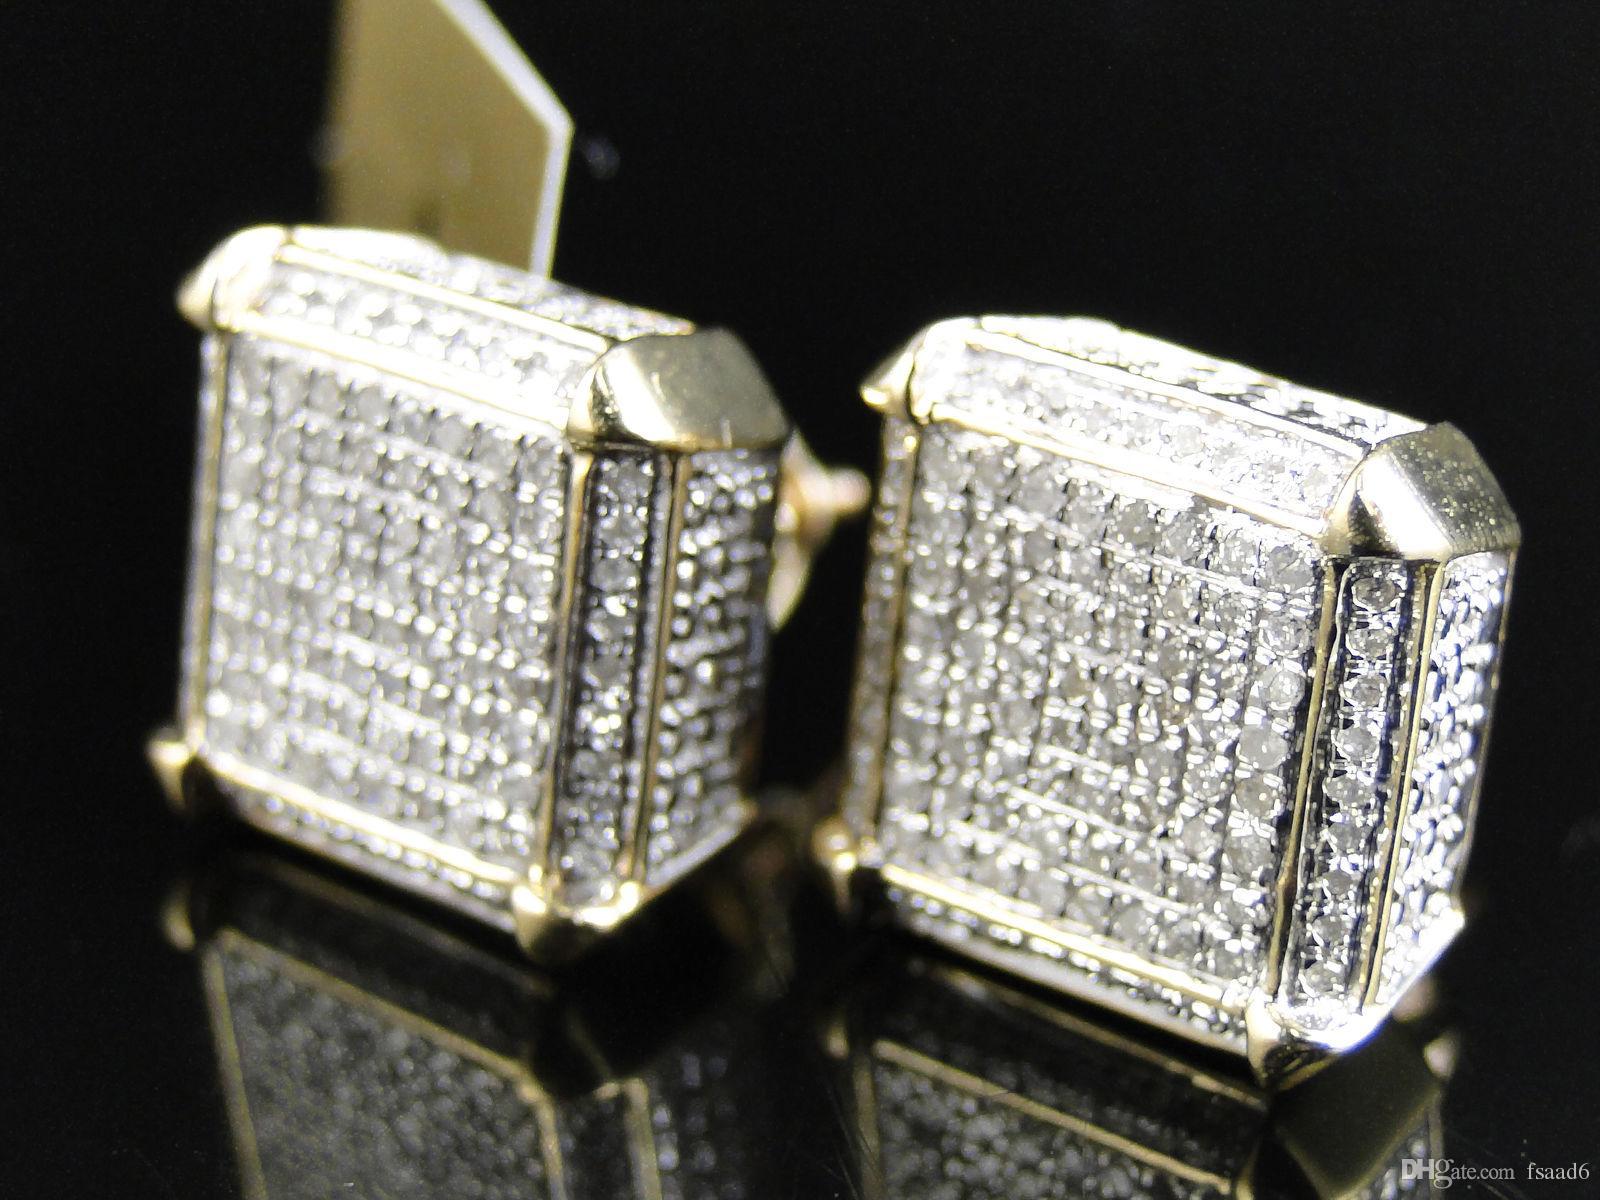 2018 10k Yellow Gold Diamond Cube Dice Shape Stud Earring From